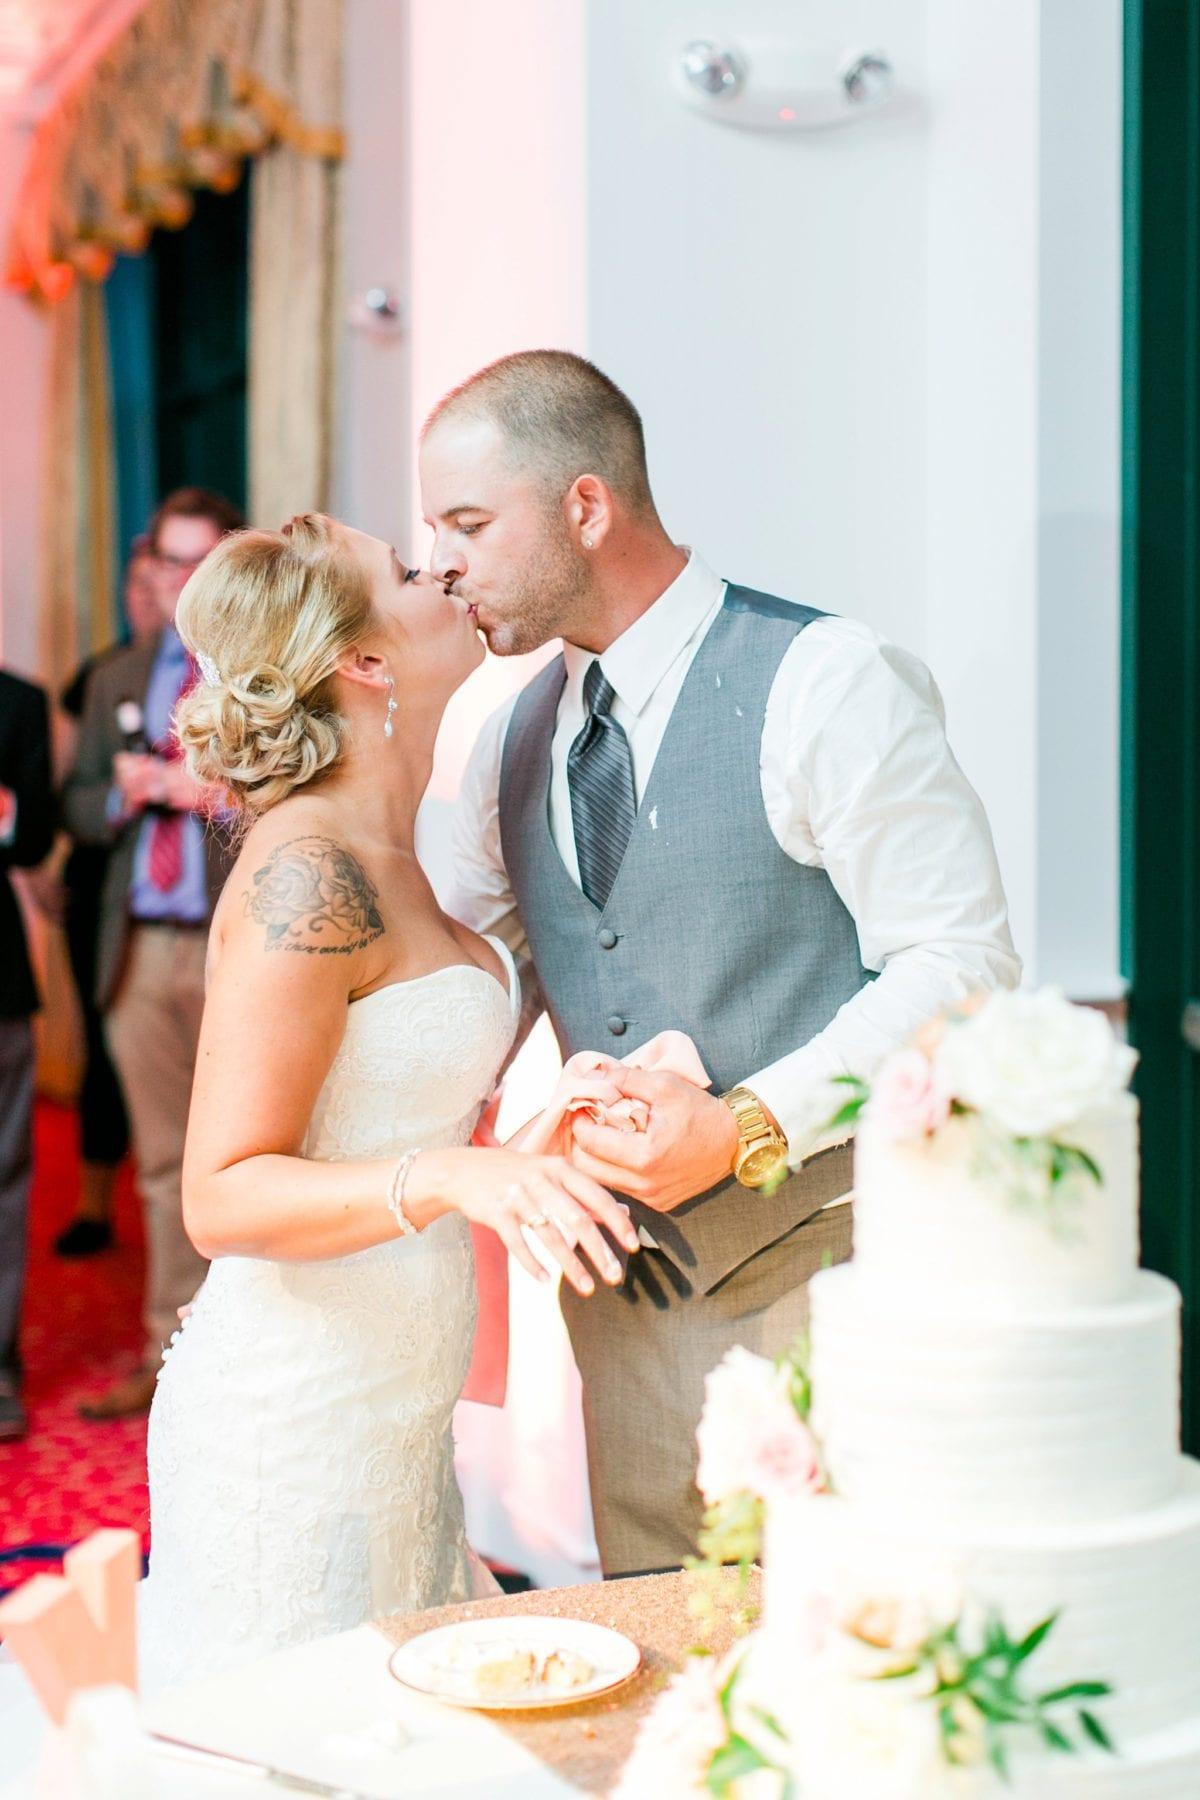 Waters Edge Wedding Photos Maryland Wedding Photographer Megan Kelsey Photography Katie & Conor-673.JPG